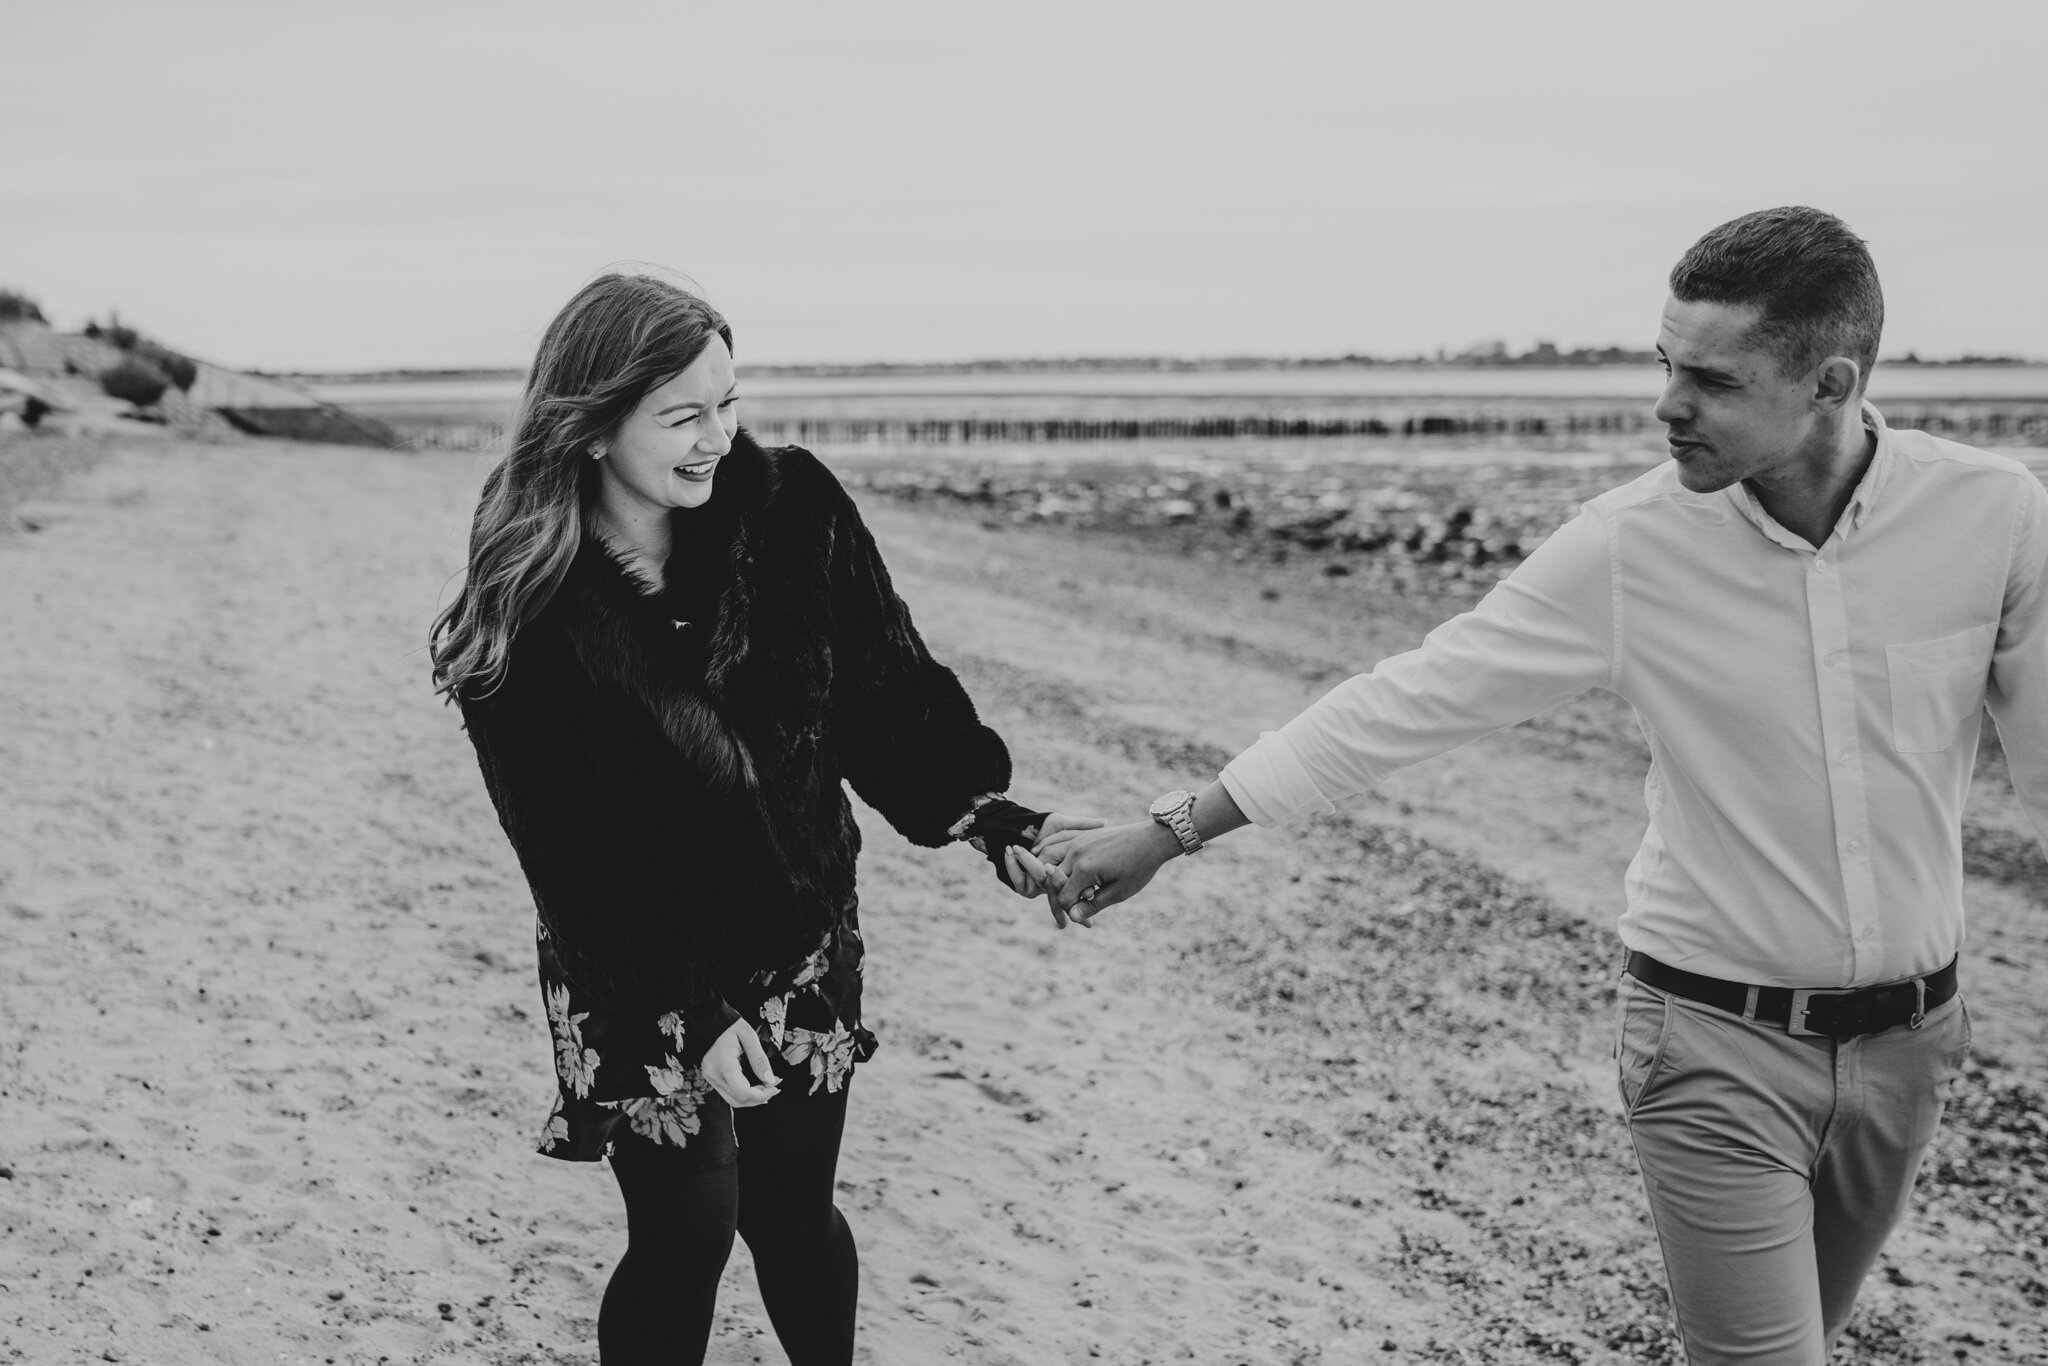 engagement-pre-wedding-hannah-michael-cudmore-grove-east-mersea-grace-elizabeth-colchester-essex-devon-suffolk-and-norfolk-alternative-wedding-and-family-photographer (3 of 51).jpg